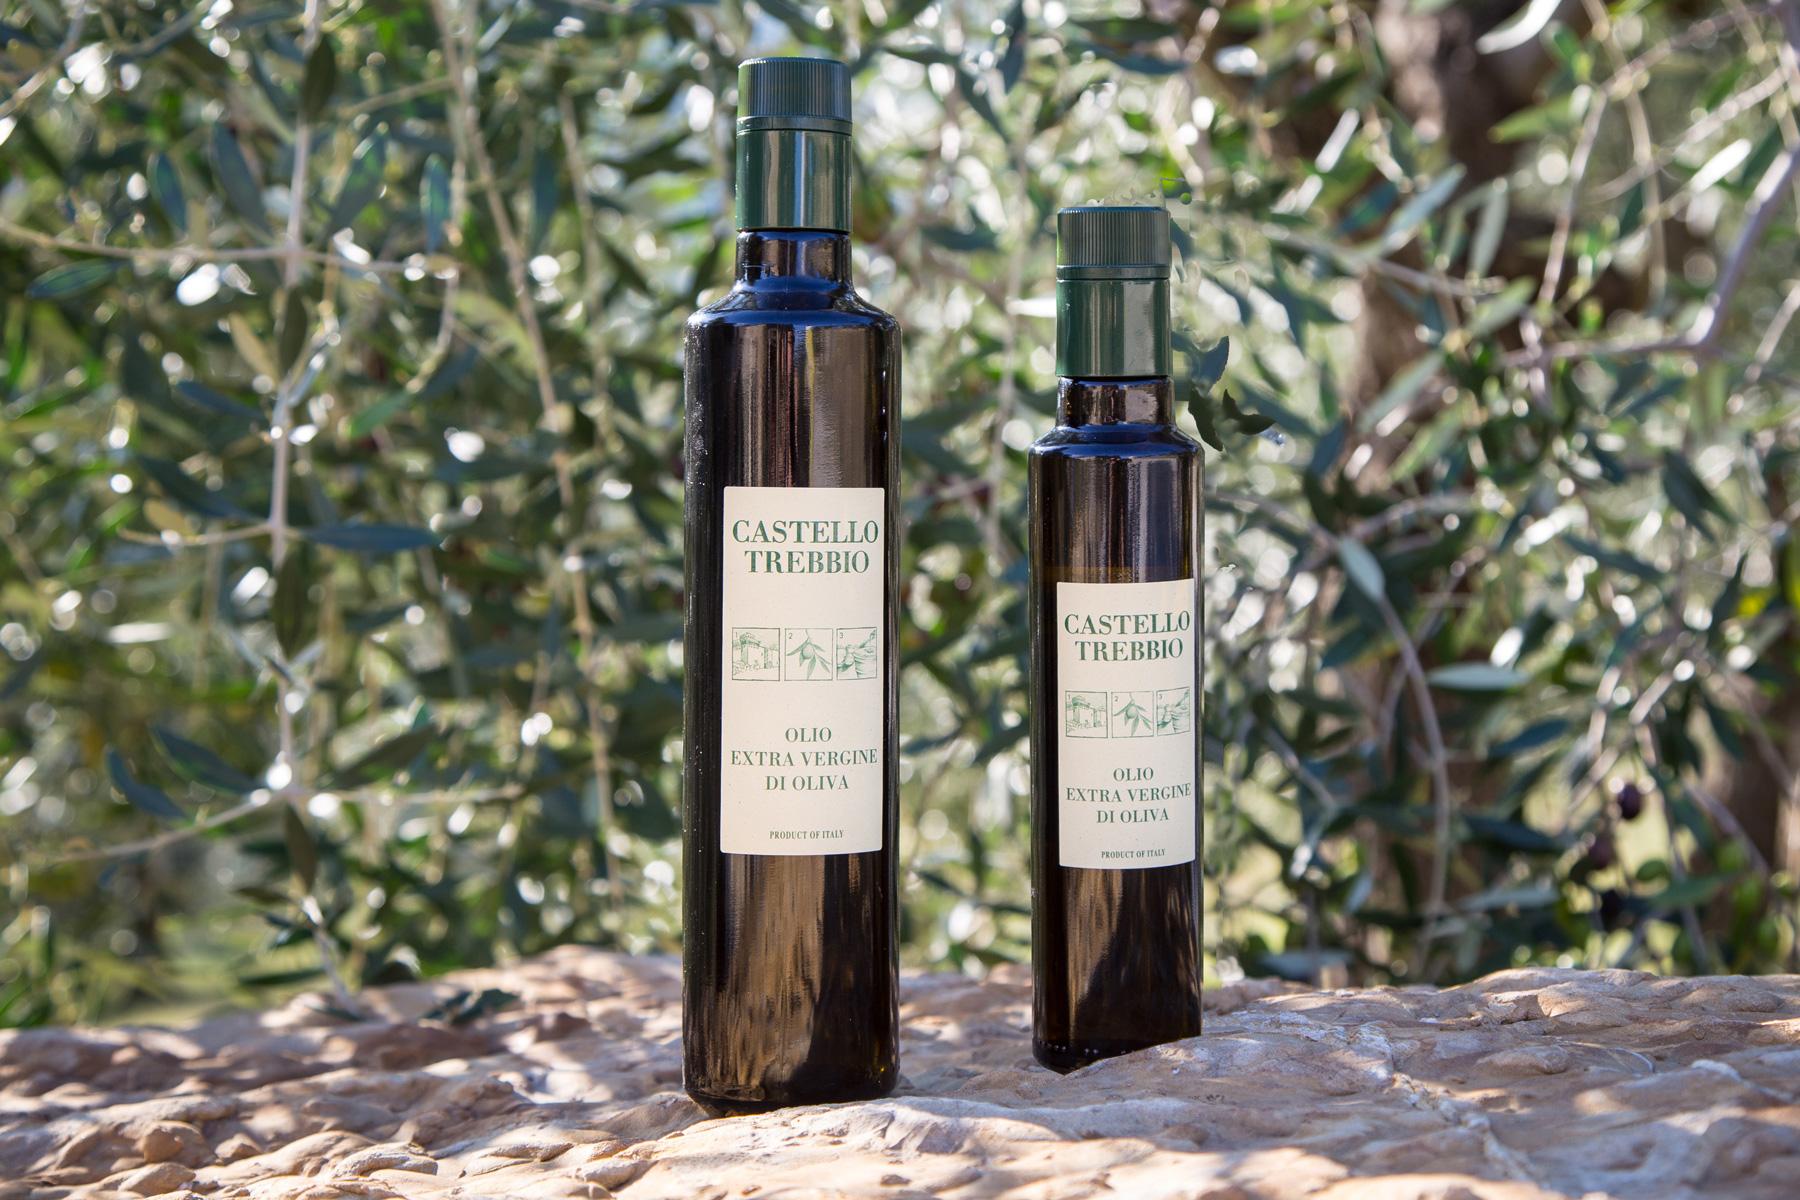 olio-extravergine-d-oliva-toscana